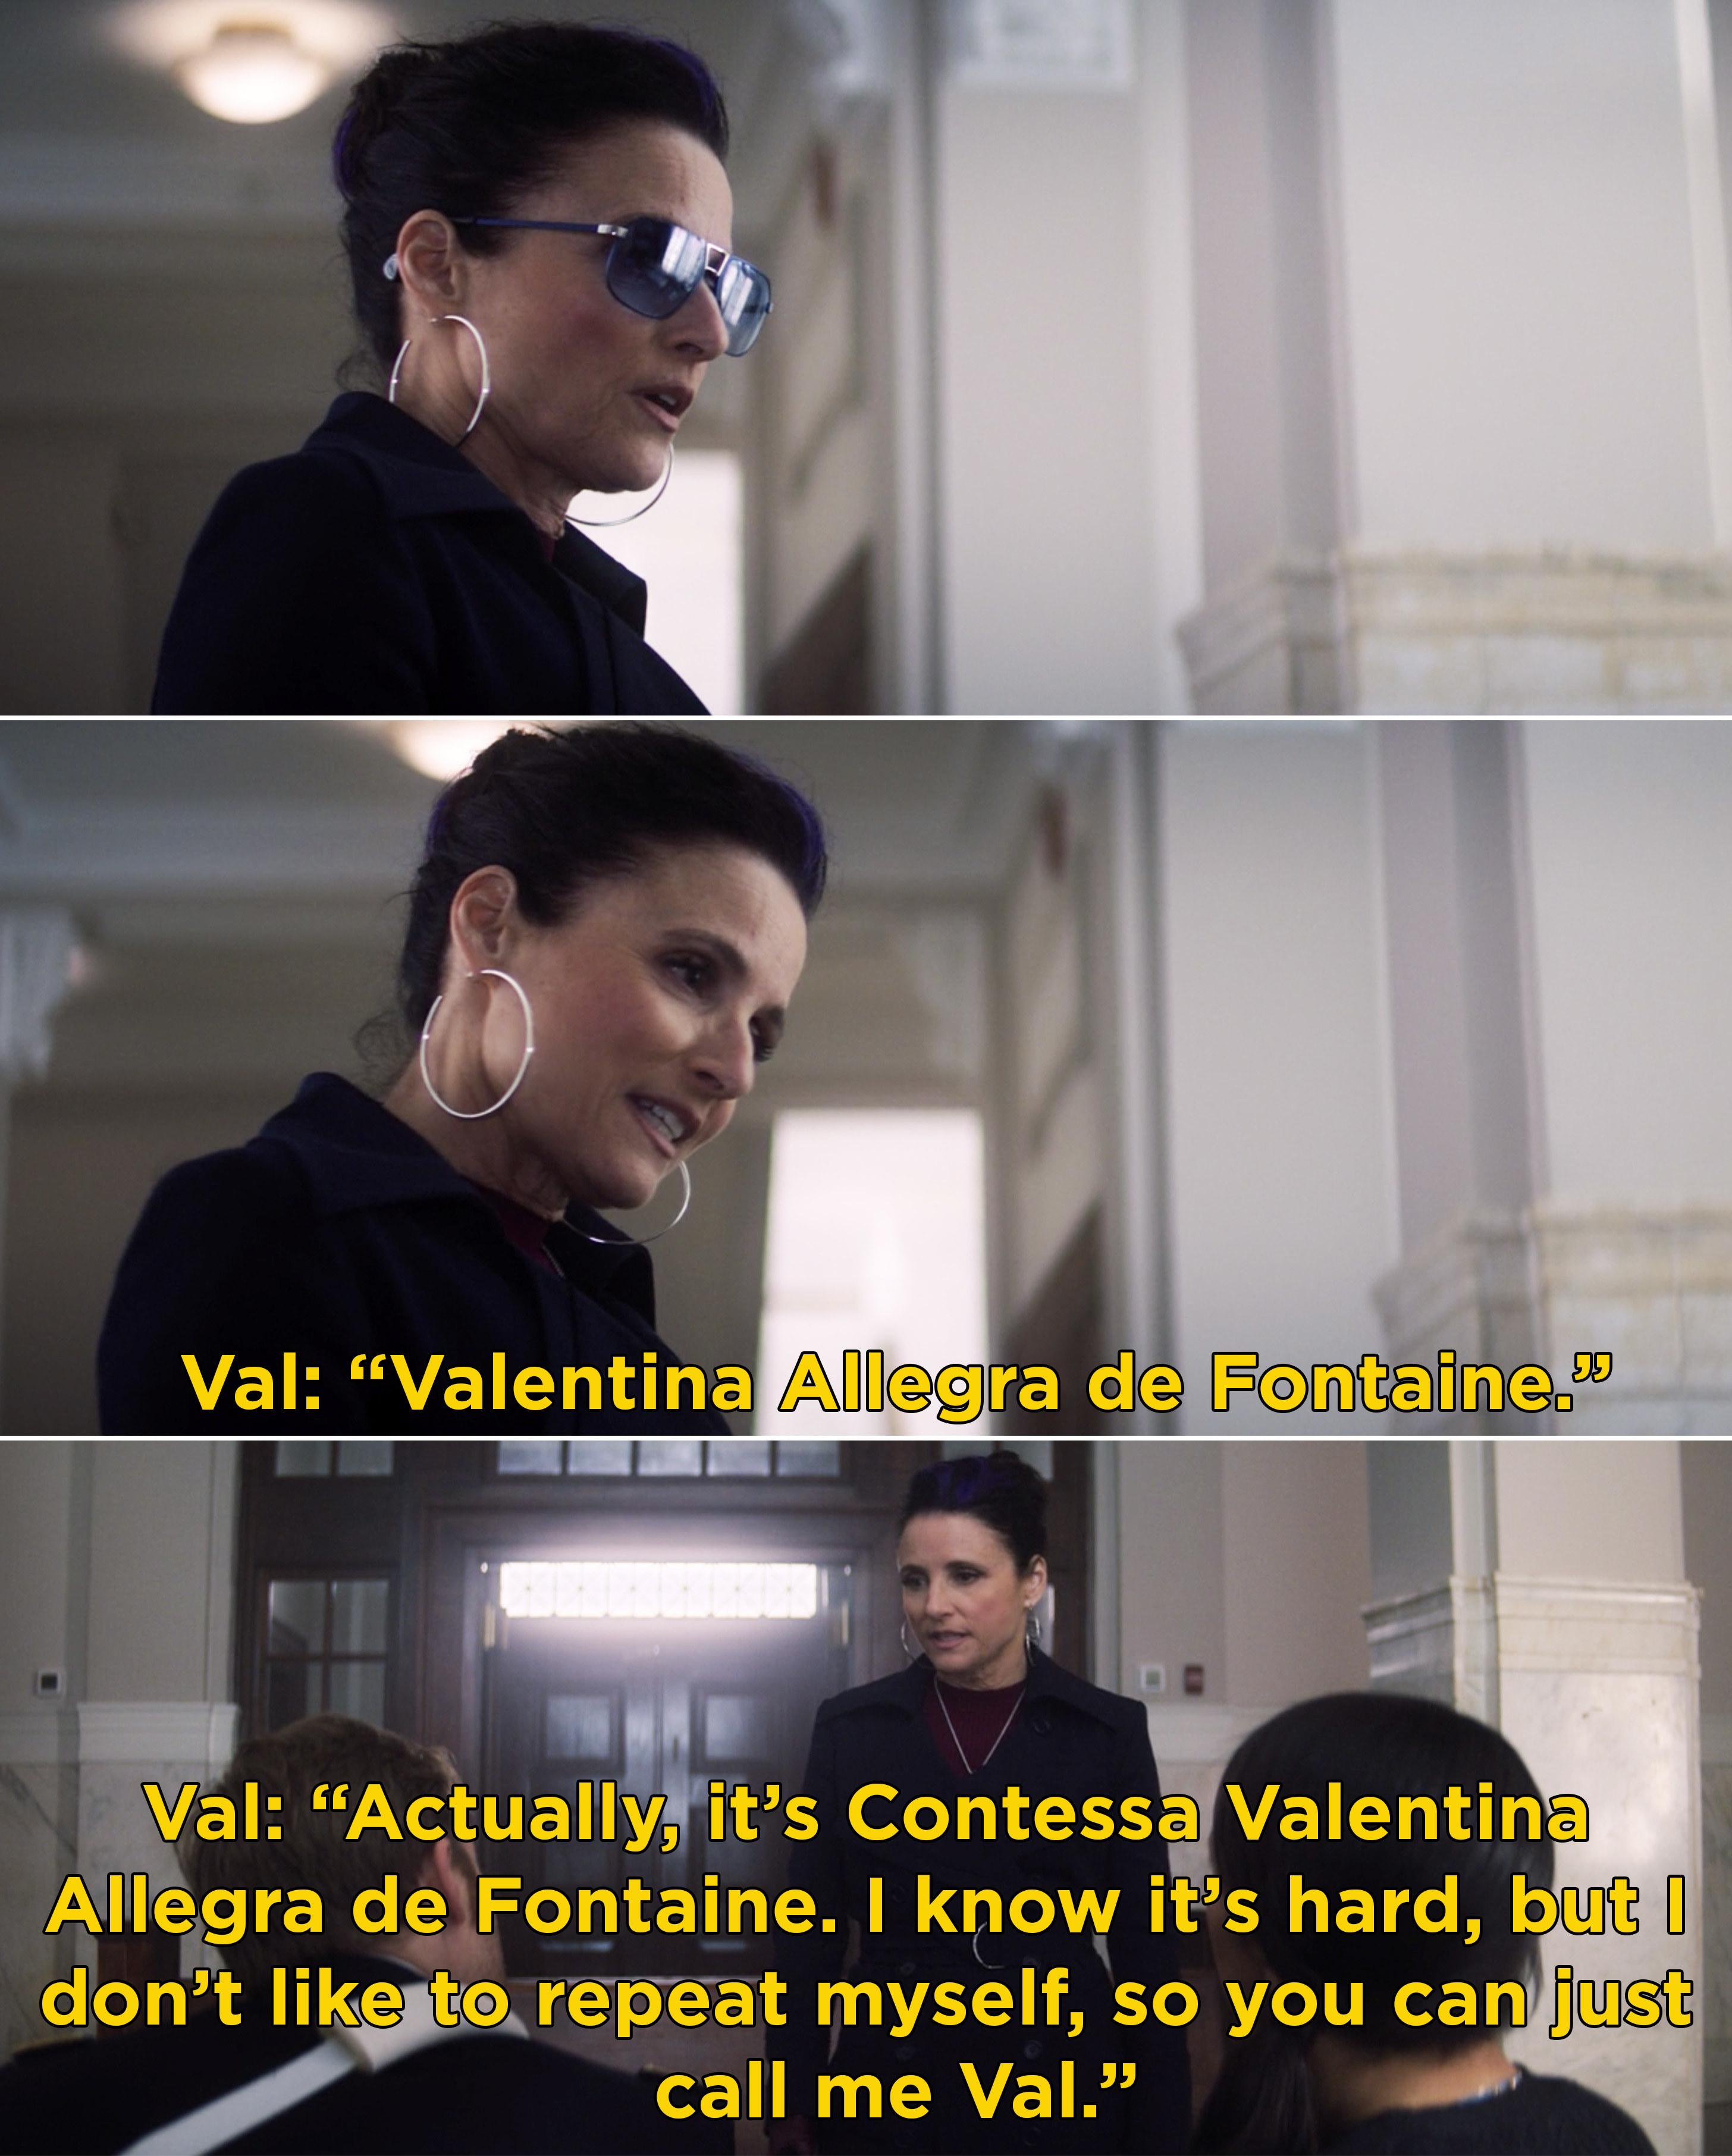 Valentina introducing herself to John Walker